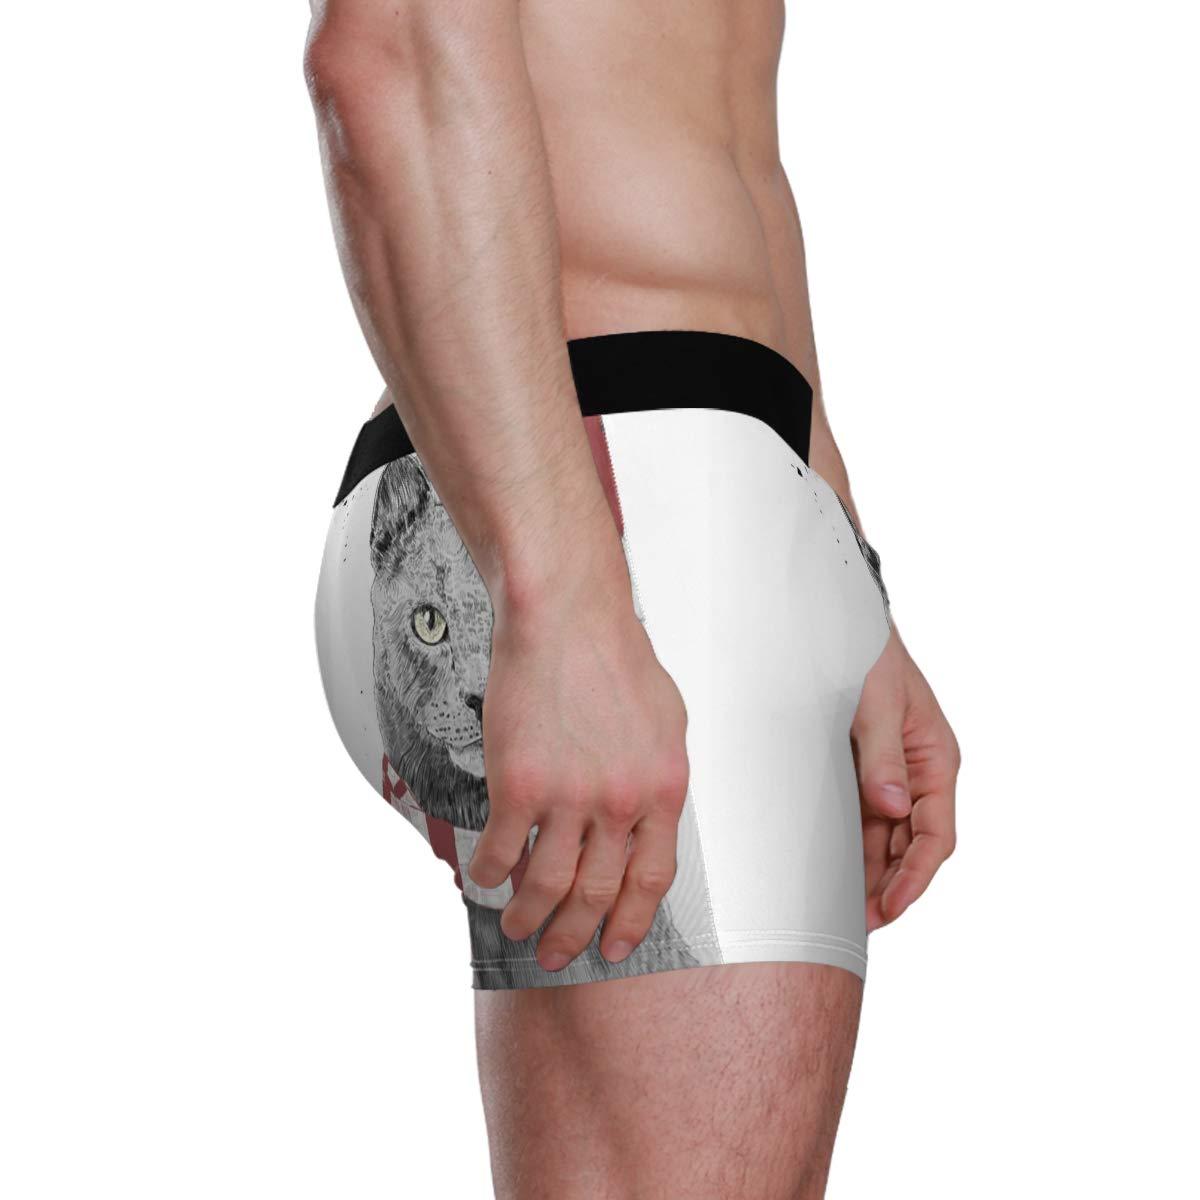 Xma Cat Vipsk Seamless Stretch Mens Polyester Boxer Briefs Underwear 1-Pack Set